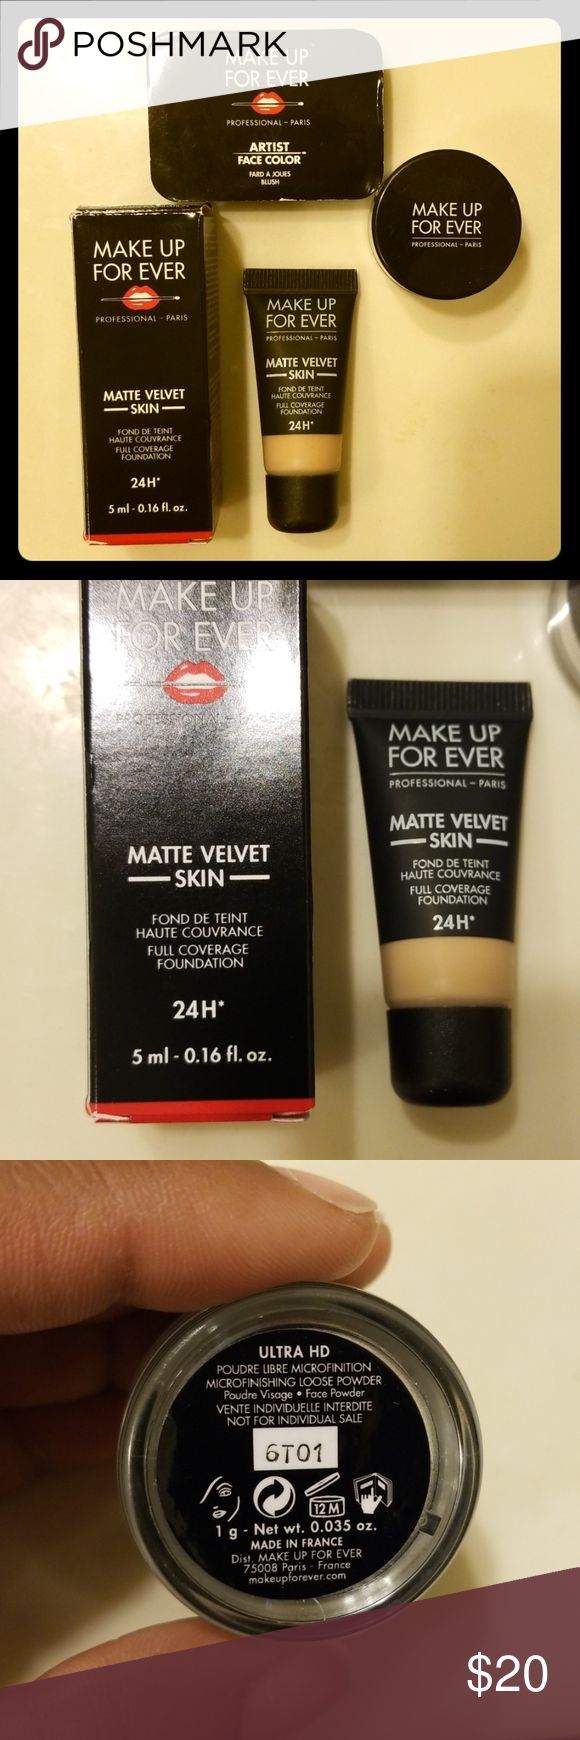 Makeup Forever MINI Bundle Foundation, microfinish loose